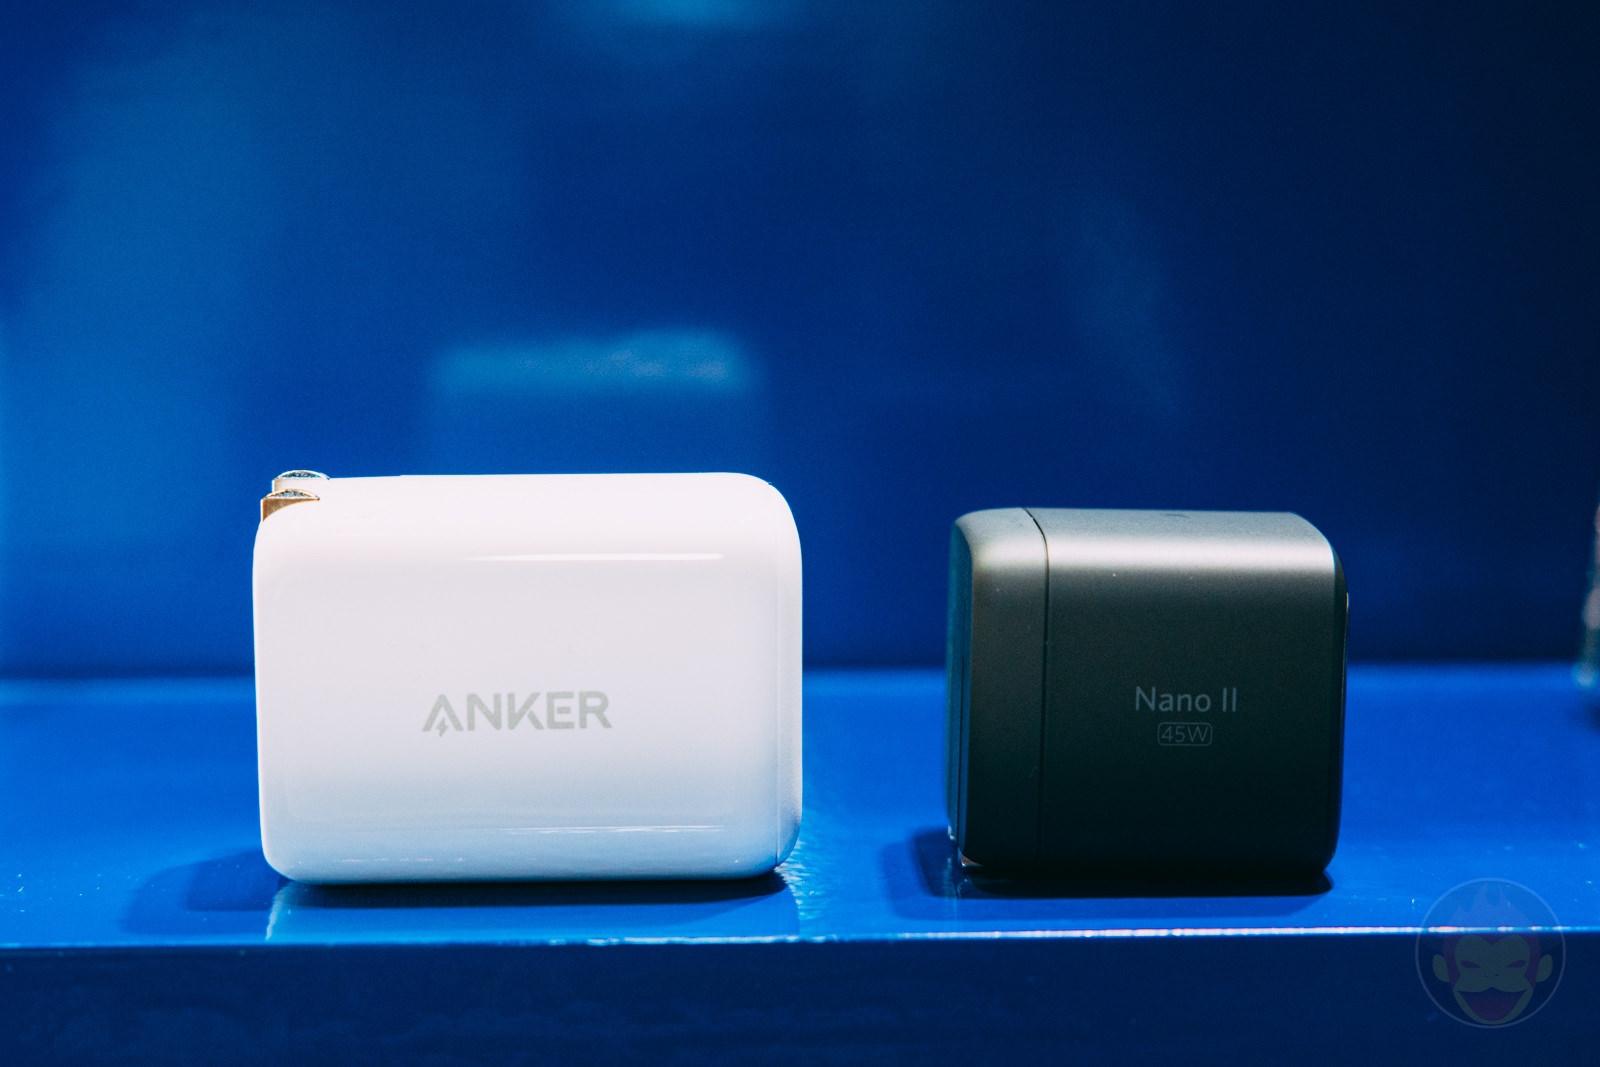 Anker GAN II Nano Series Hands On 13